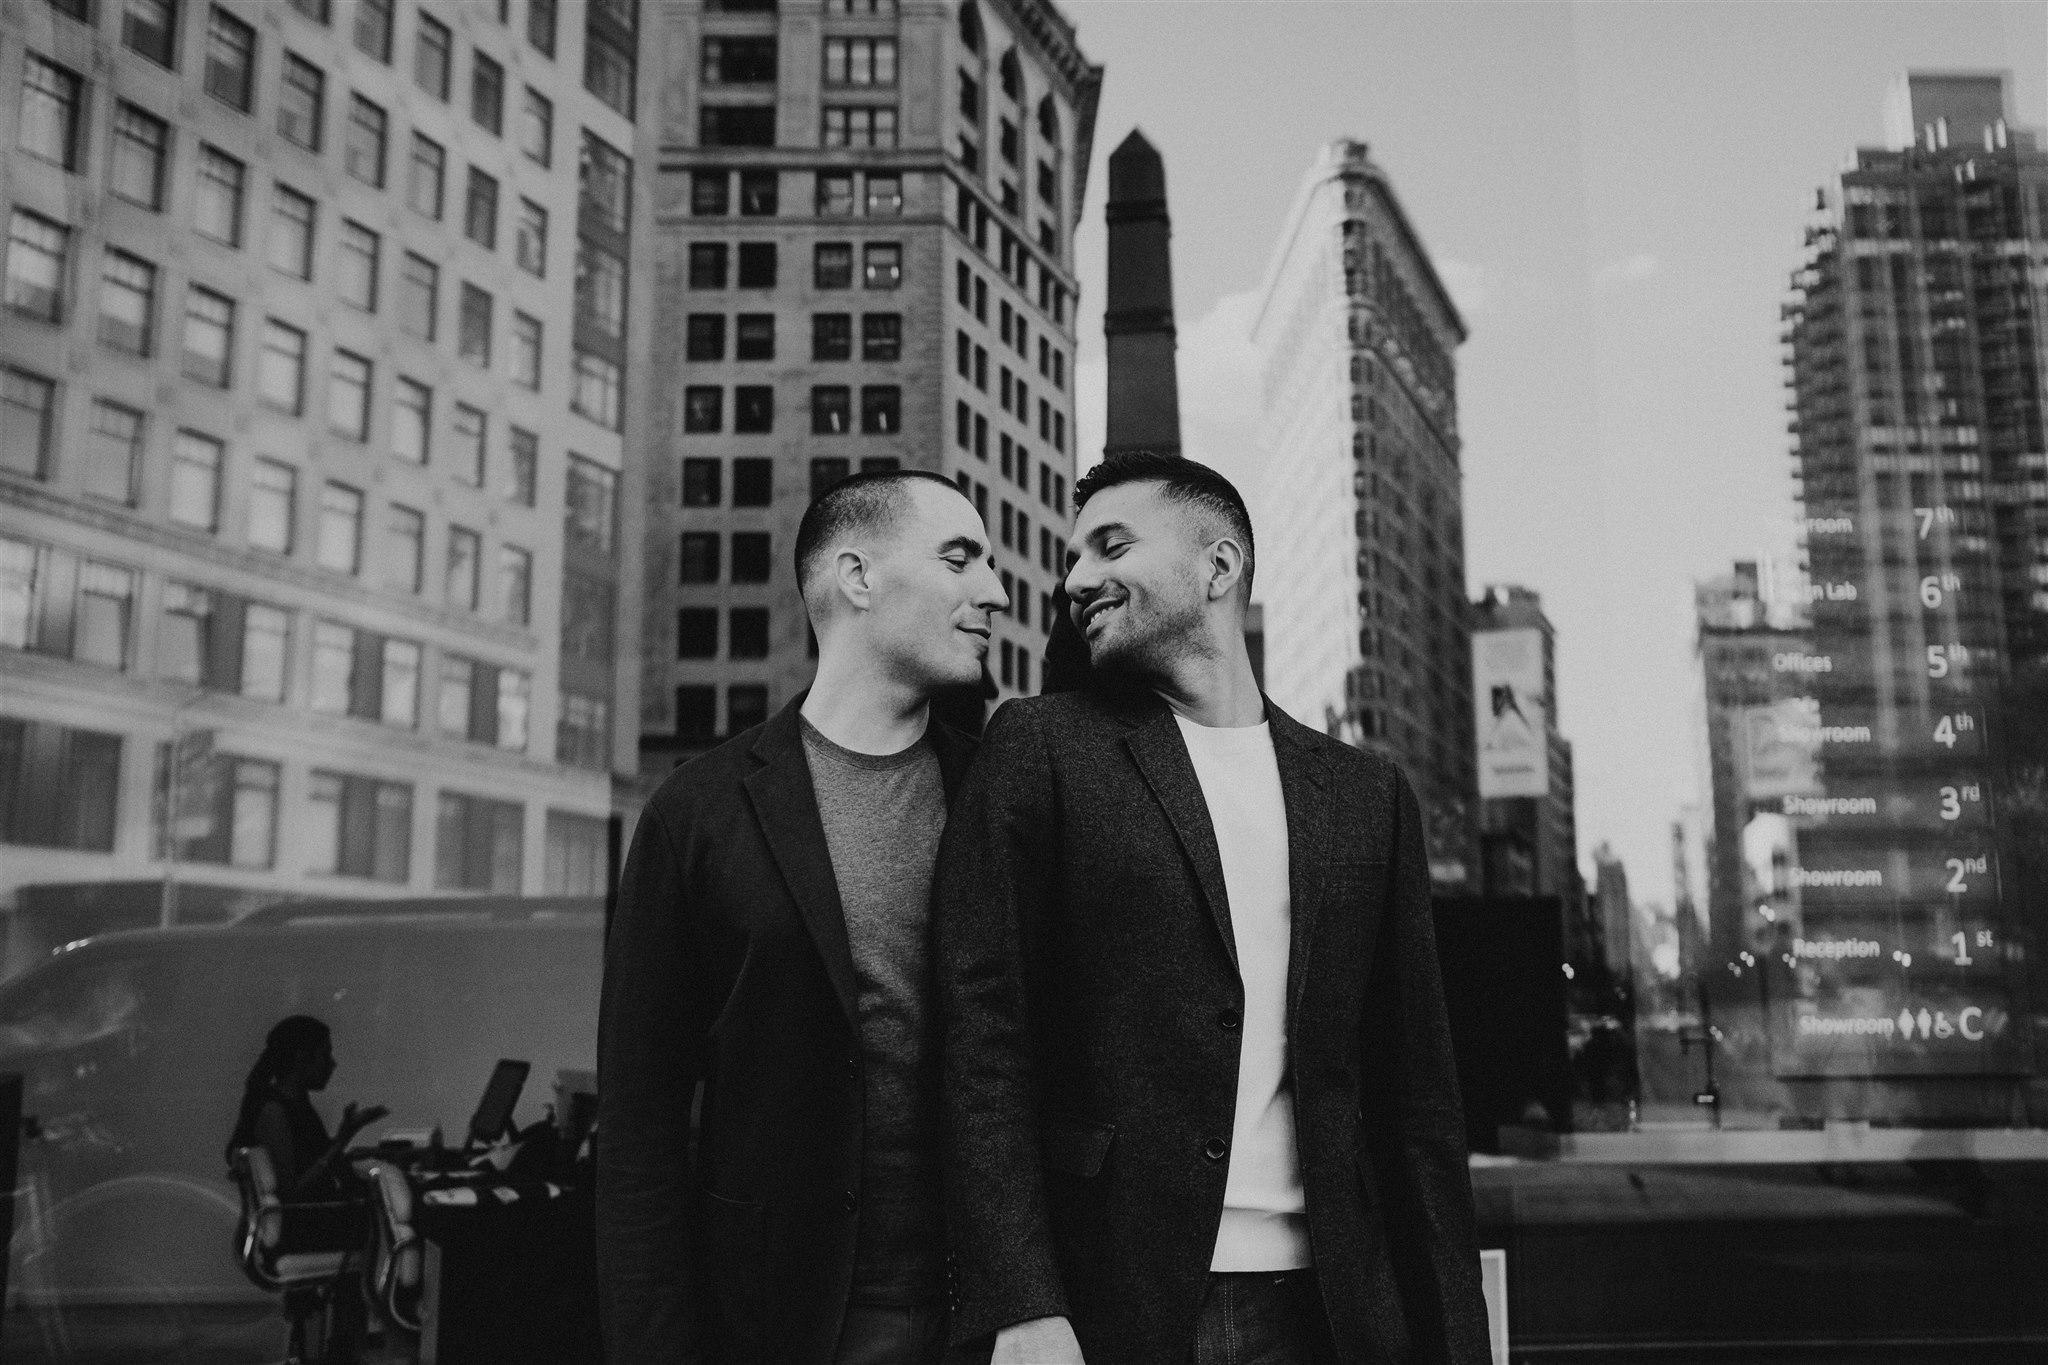 lbgtq-gay-wedding-elopement-photography-chellise-michael-photography283.JPG